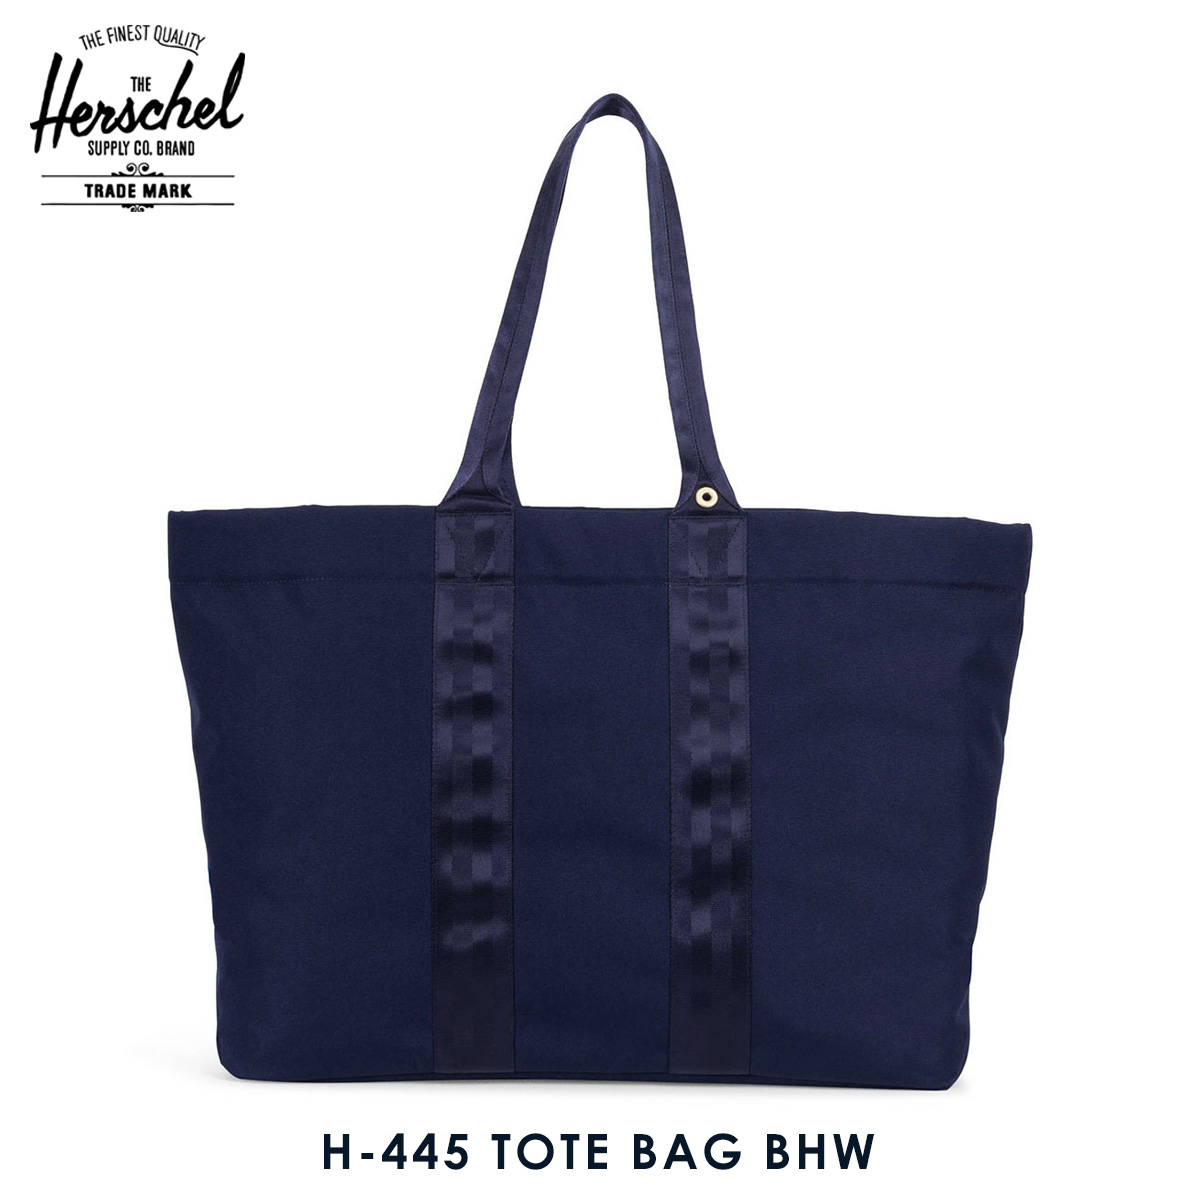 15%OFFセール 【販売期間 6/4 20:00~6/11 01:59】 ハーシェル バッグ 正規販売店 Herschel Supply ハーシャルサプライ 鞄 トートバッグ H-445 TOTE BAG BHW 10418-01982-OS PEACOAT 父の日